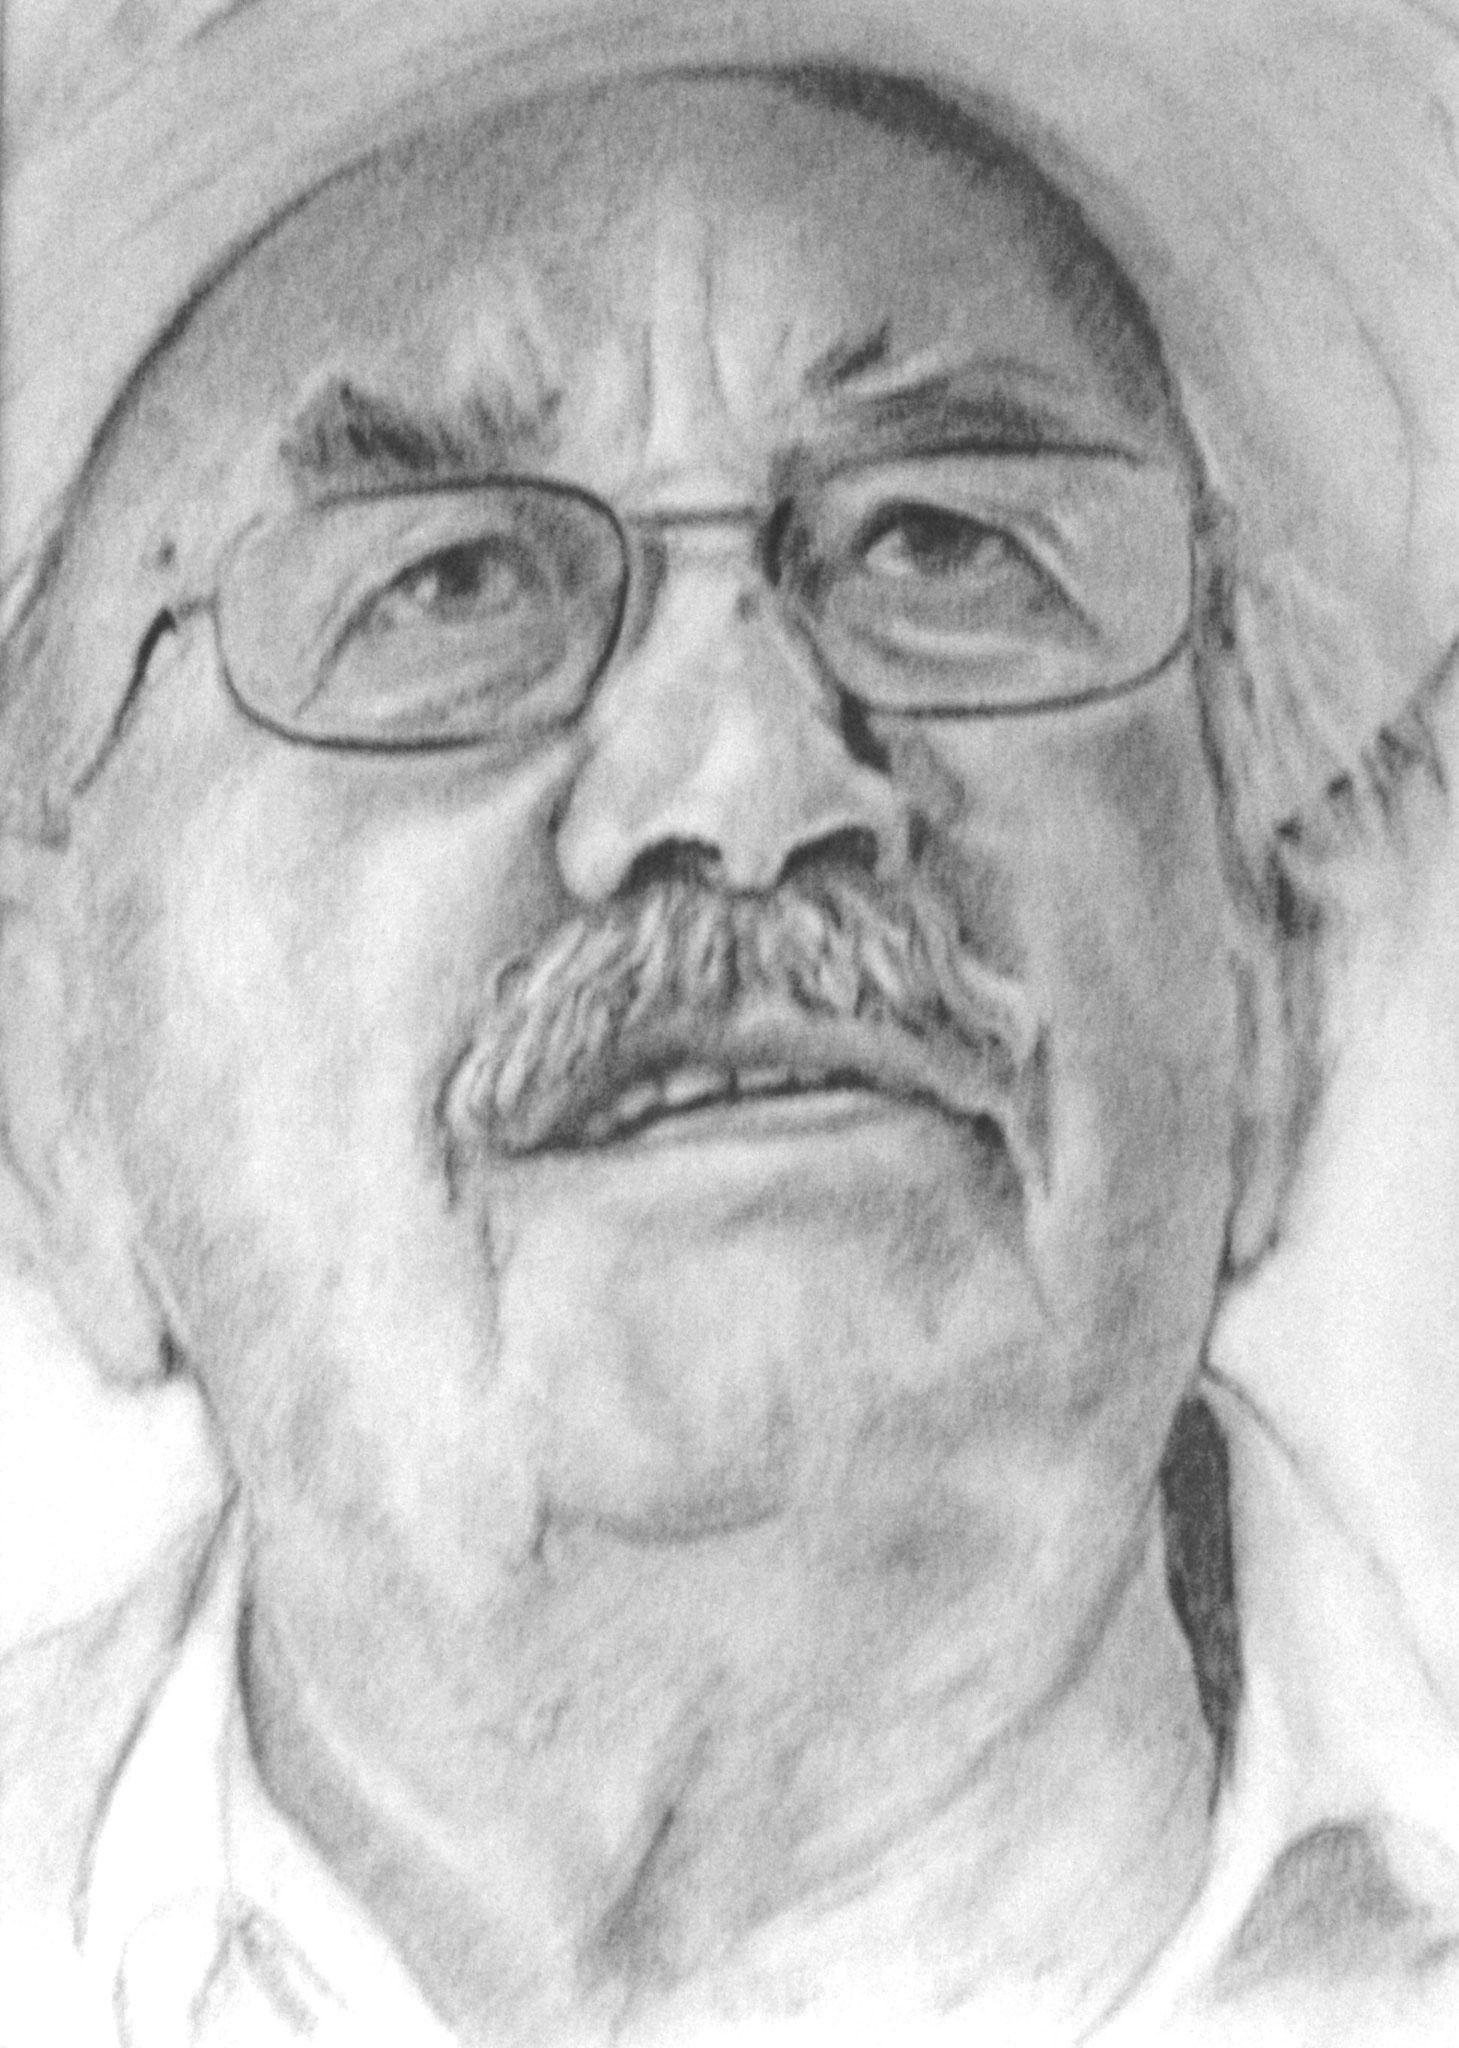 ART HFrei - Josef - Bleistift